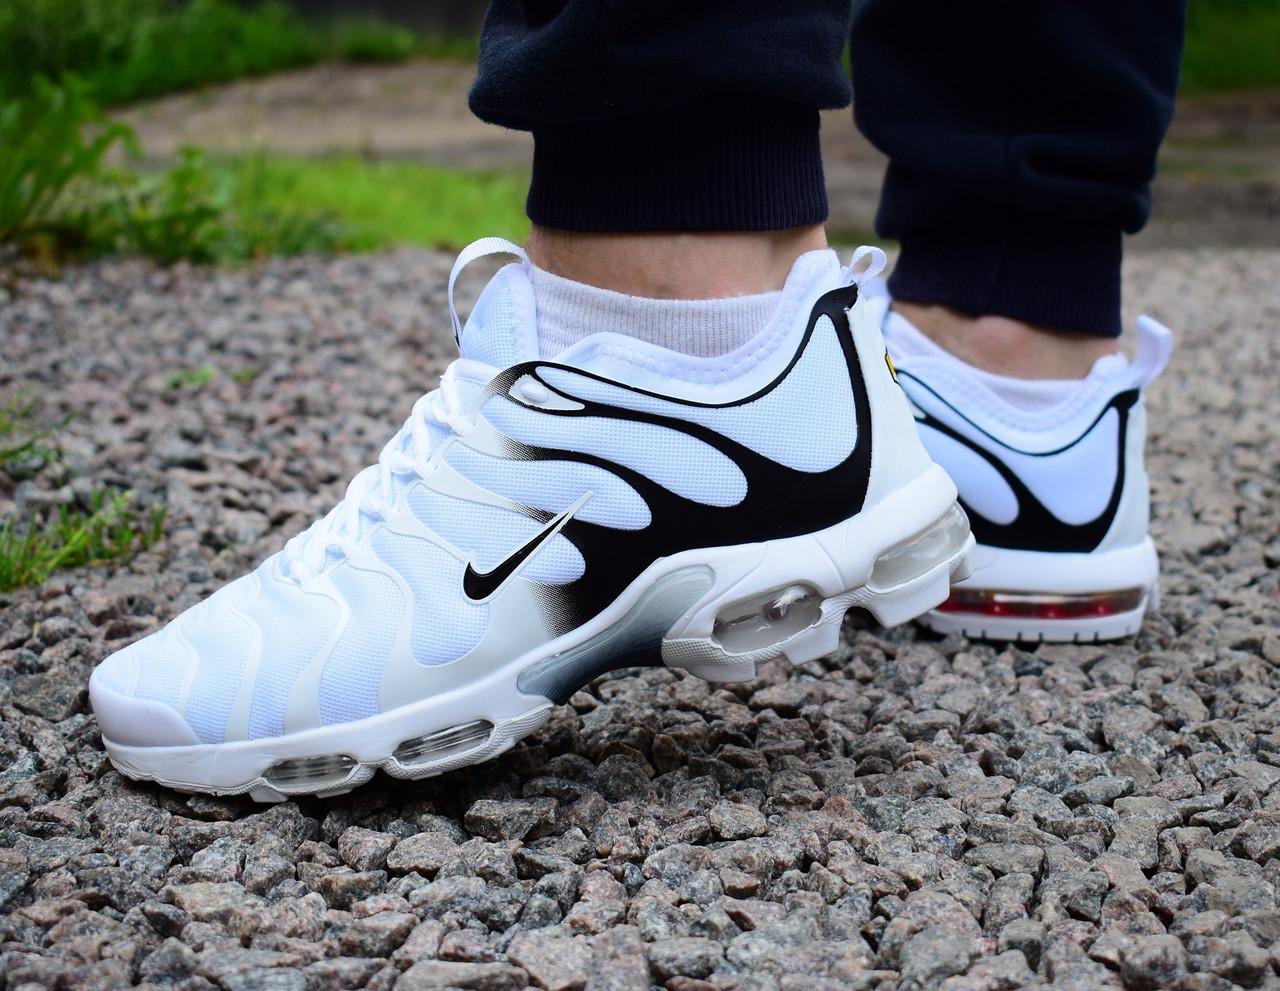 65298e54 Nike Air Max TN Plus white кроссовки мужские найк аир макс тн плюс белые -  Verona24